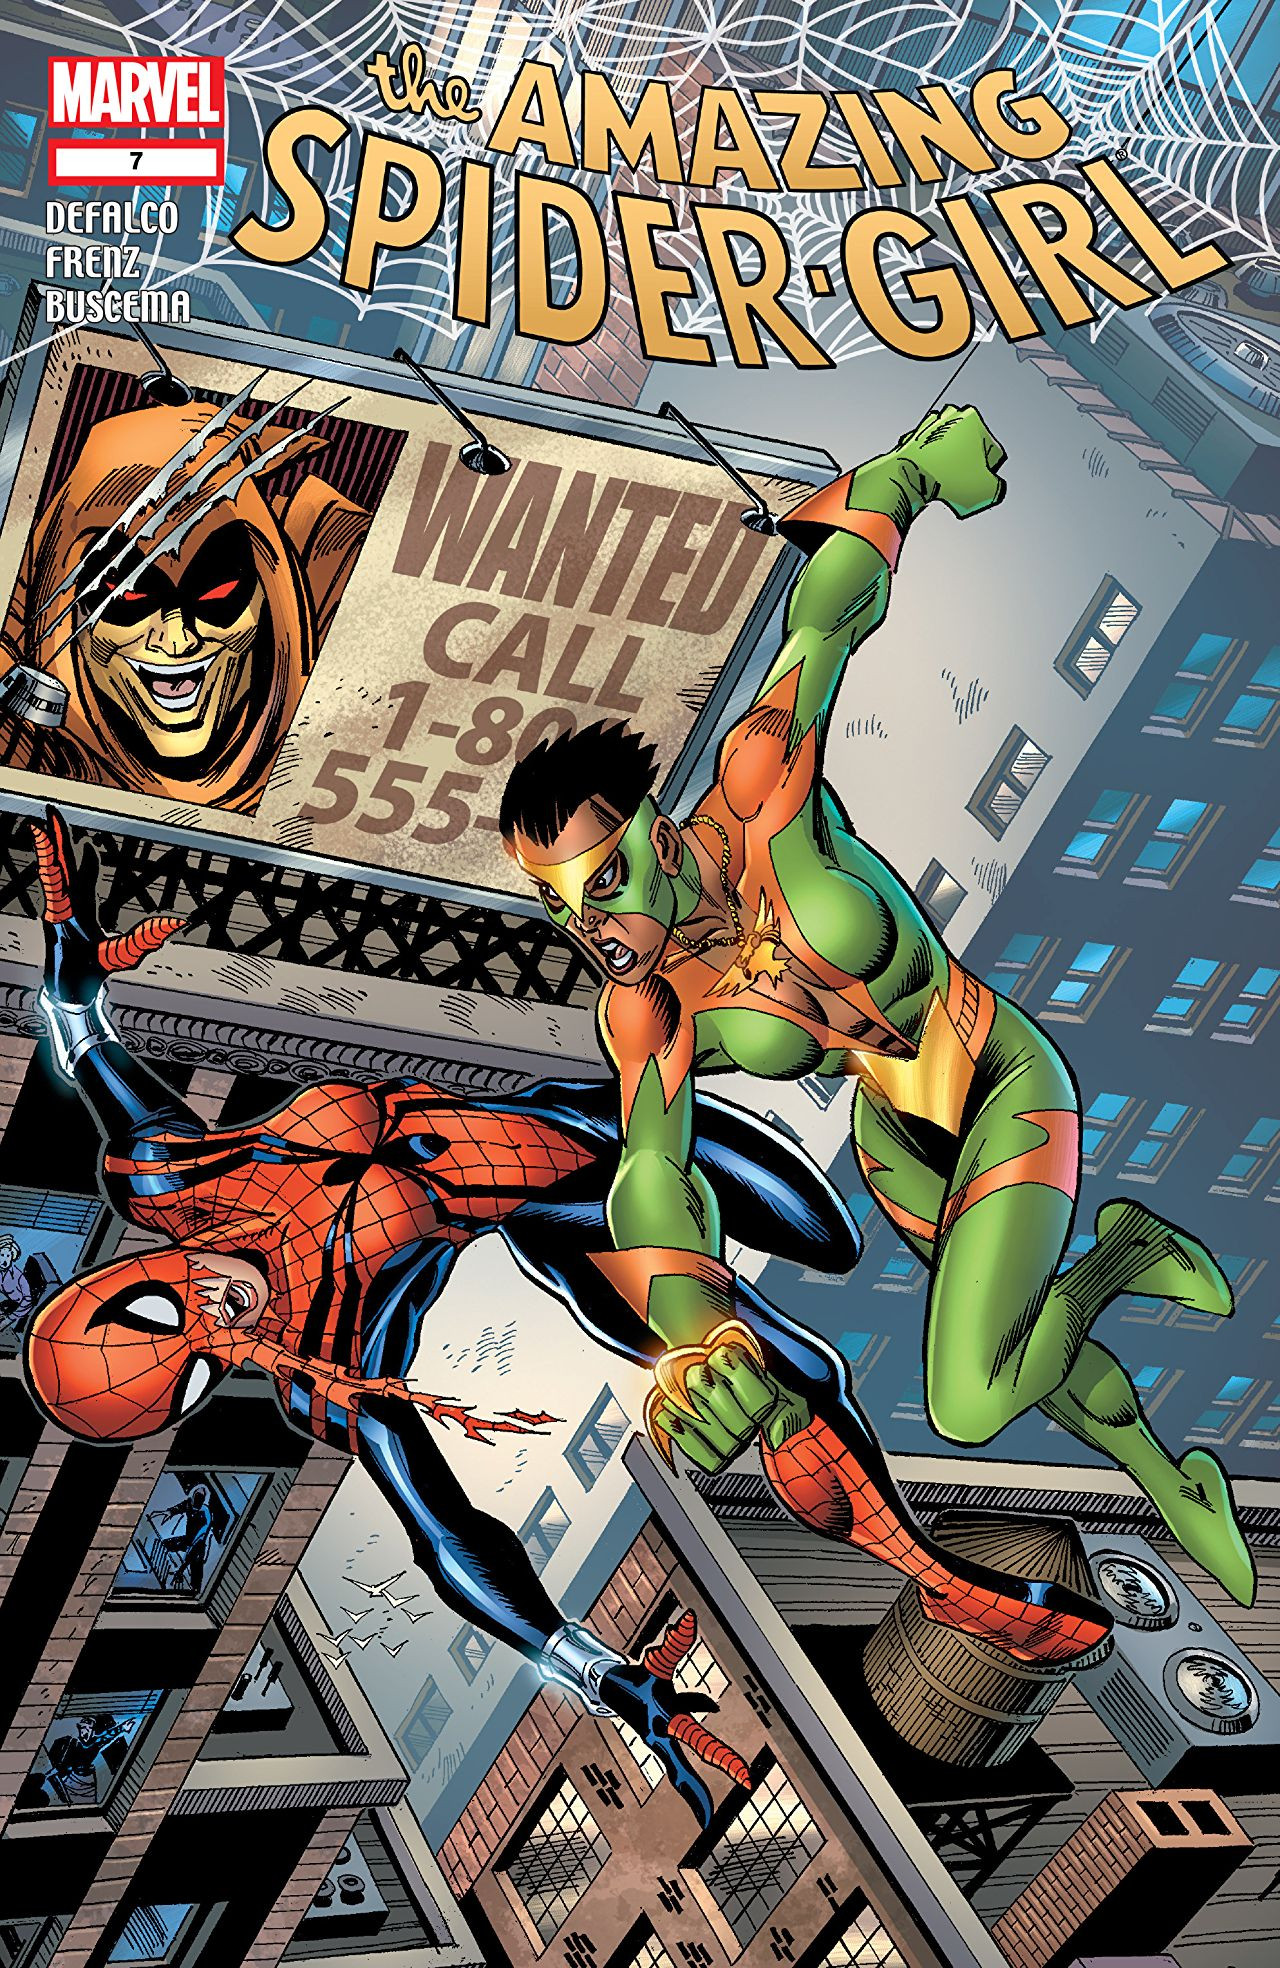 Amazing Spider-Girl Vol 1 7